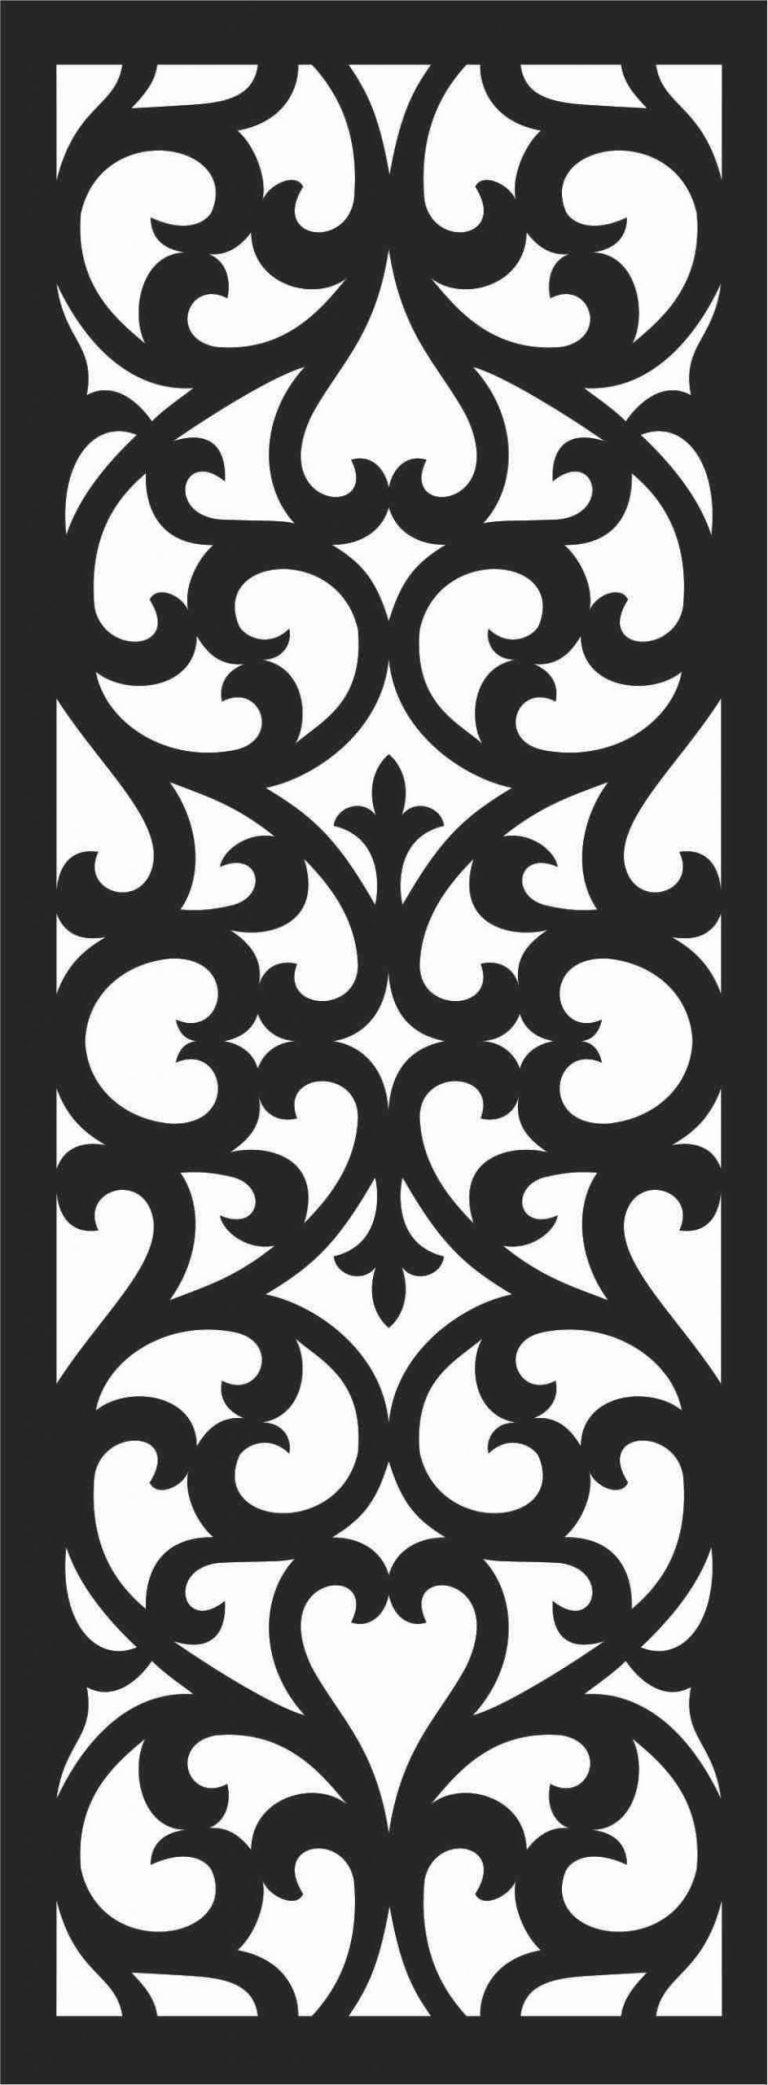 Screen Panel Patterns Seamless 53 Free DXF File